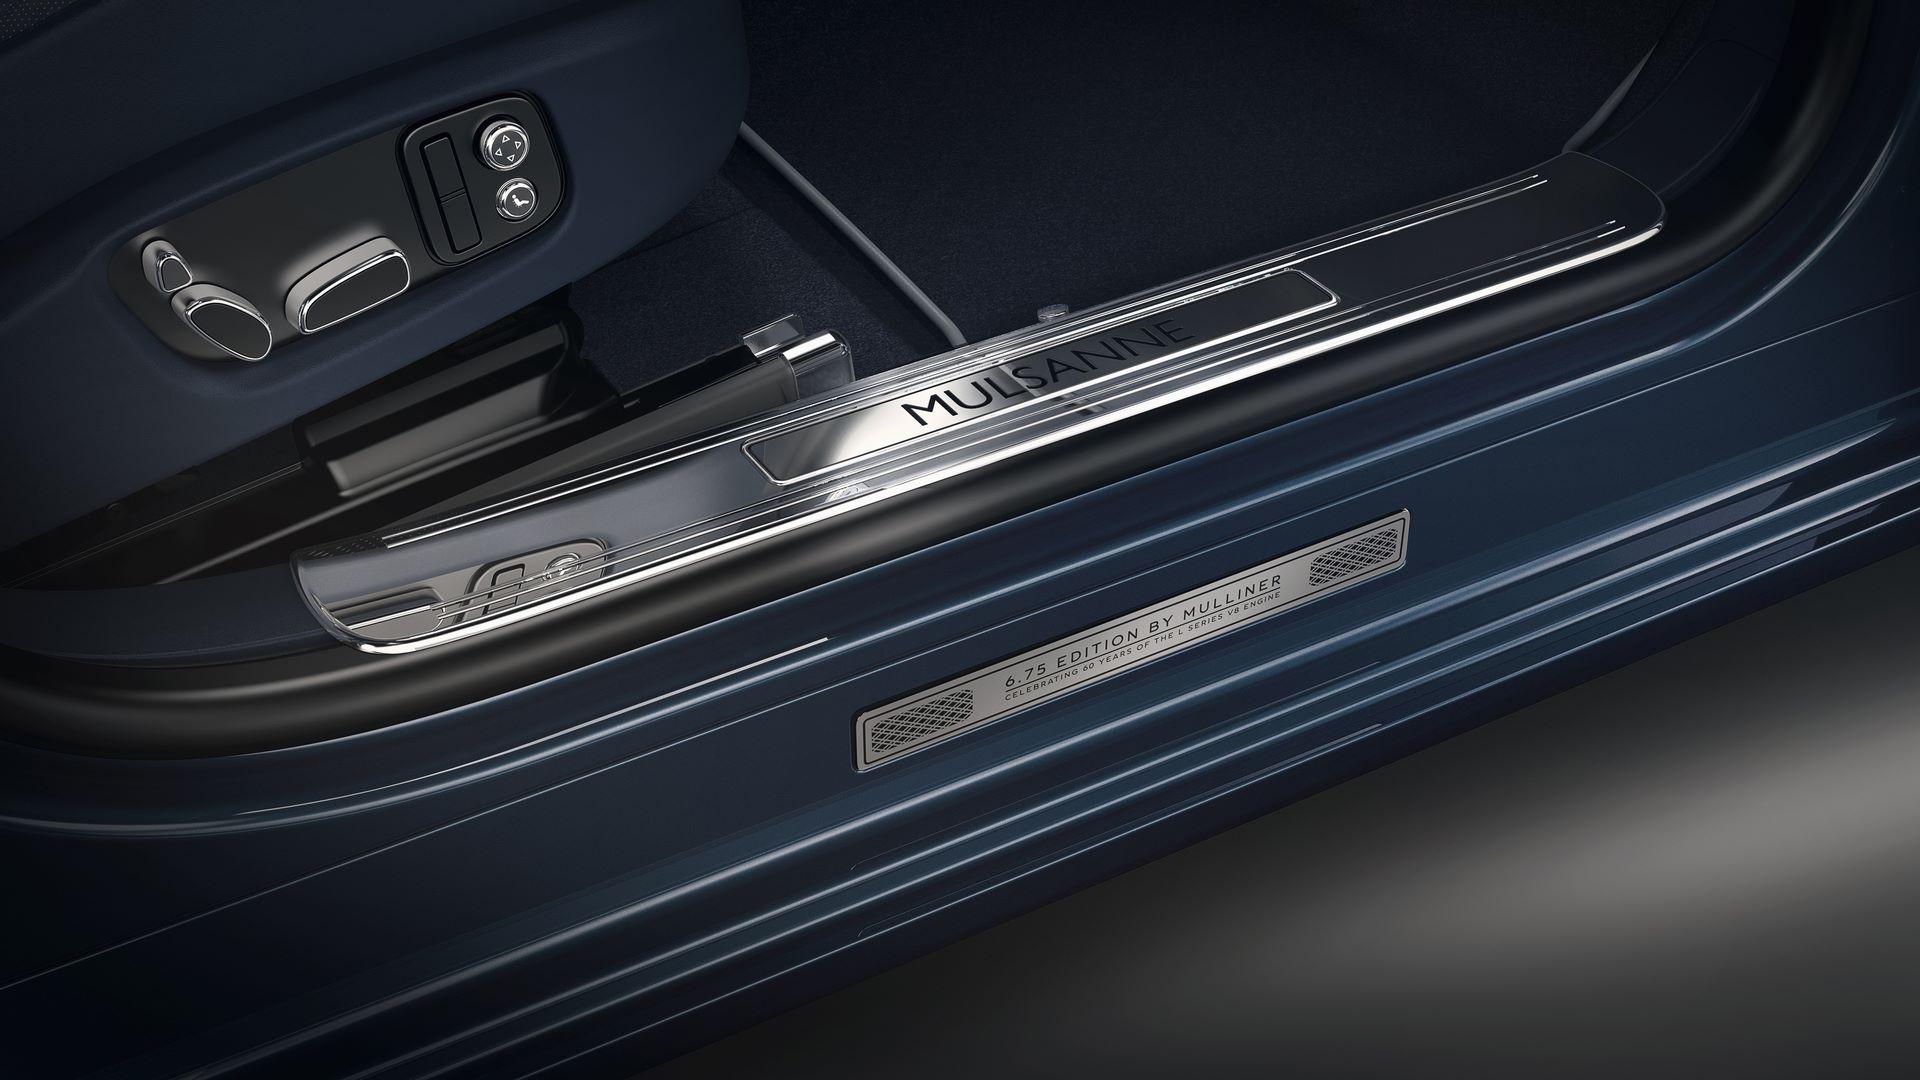 Bentley-Mulsanne-6.75-Edition-By-Mulliner-7